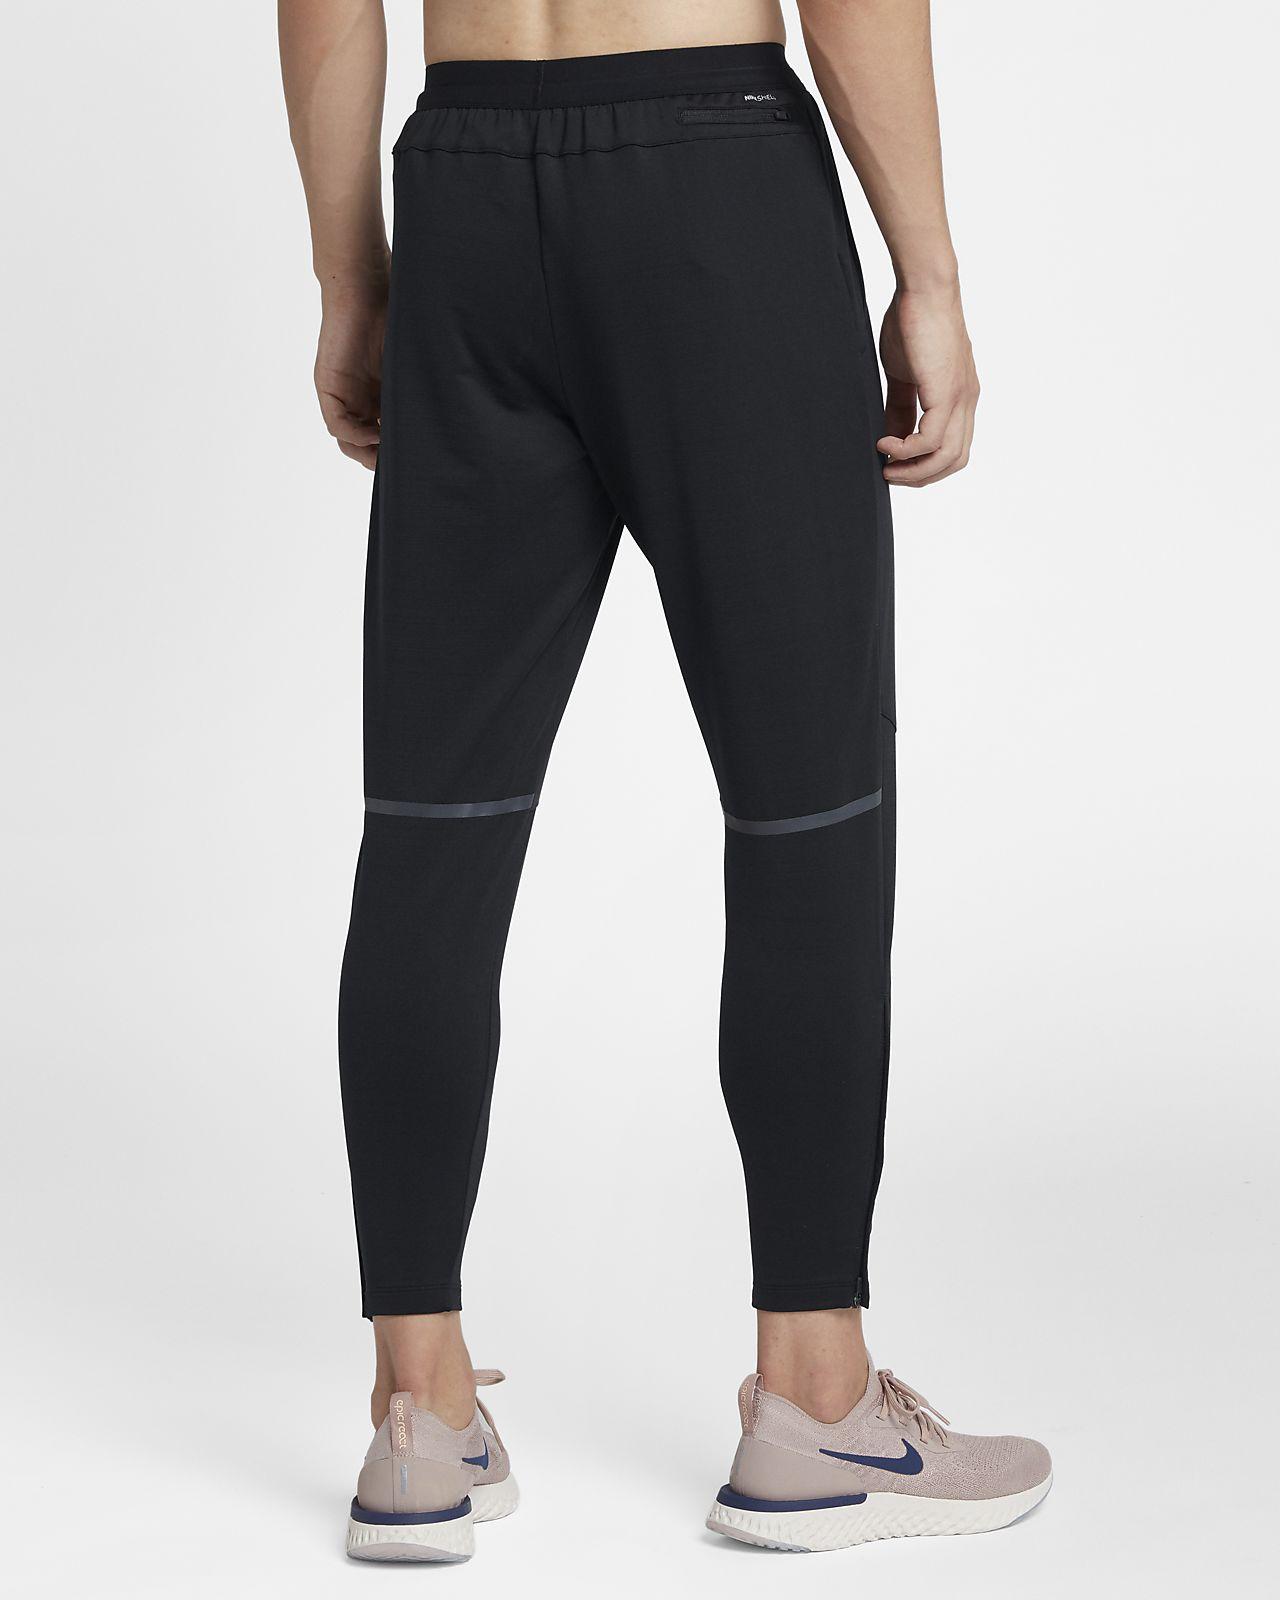 Pantalon de running Nike Shield Phenom pour Homme